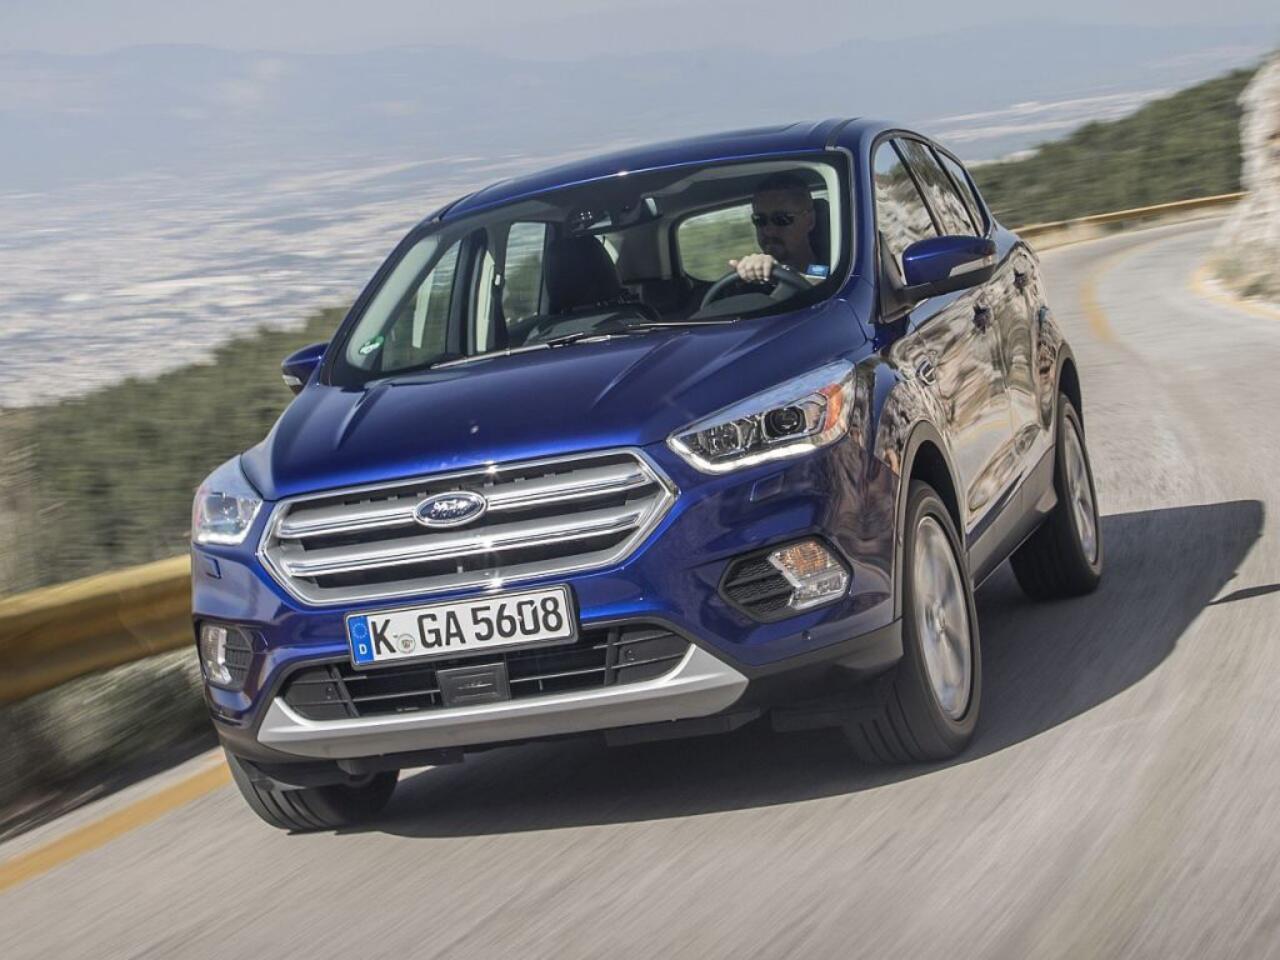 Bild zu Platz 15: Ford Kuga